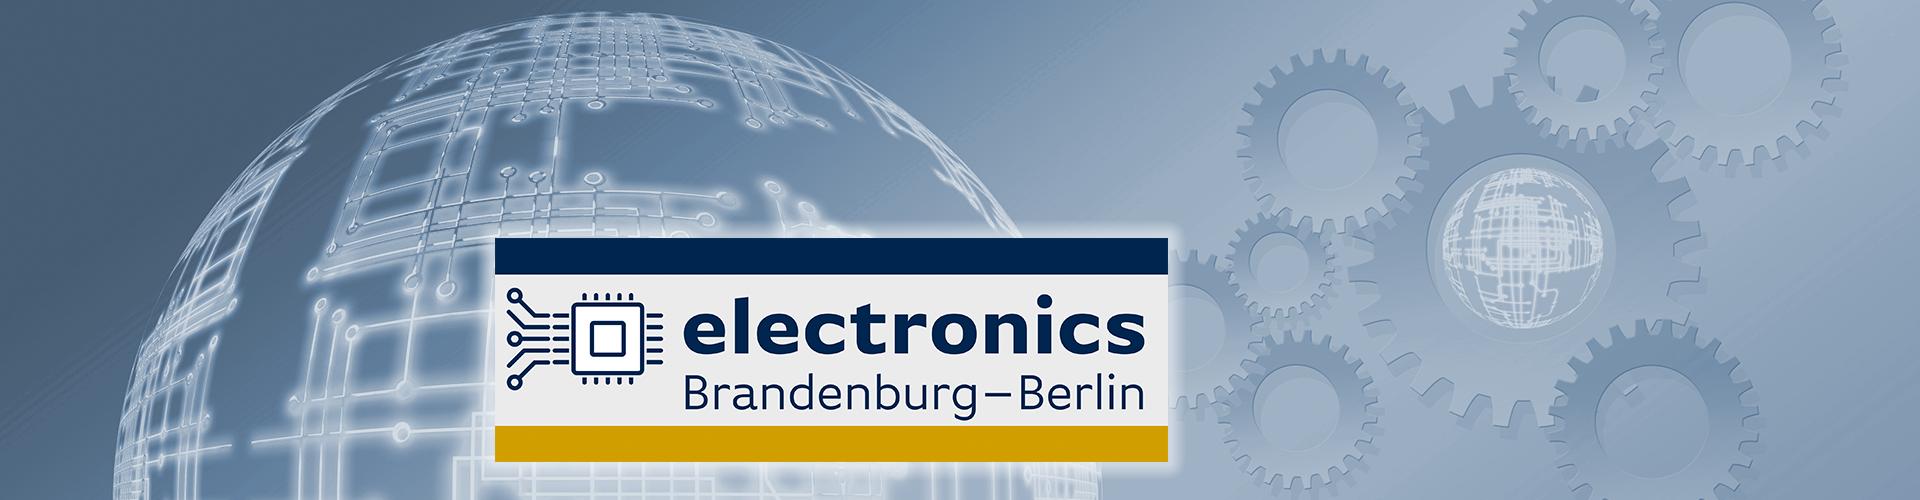 Electronics Brandenburg - Berlin